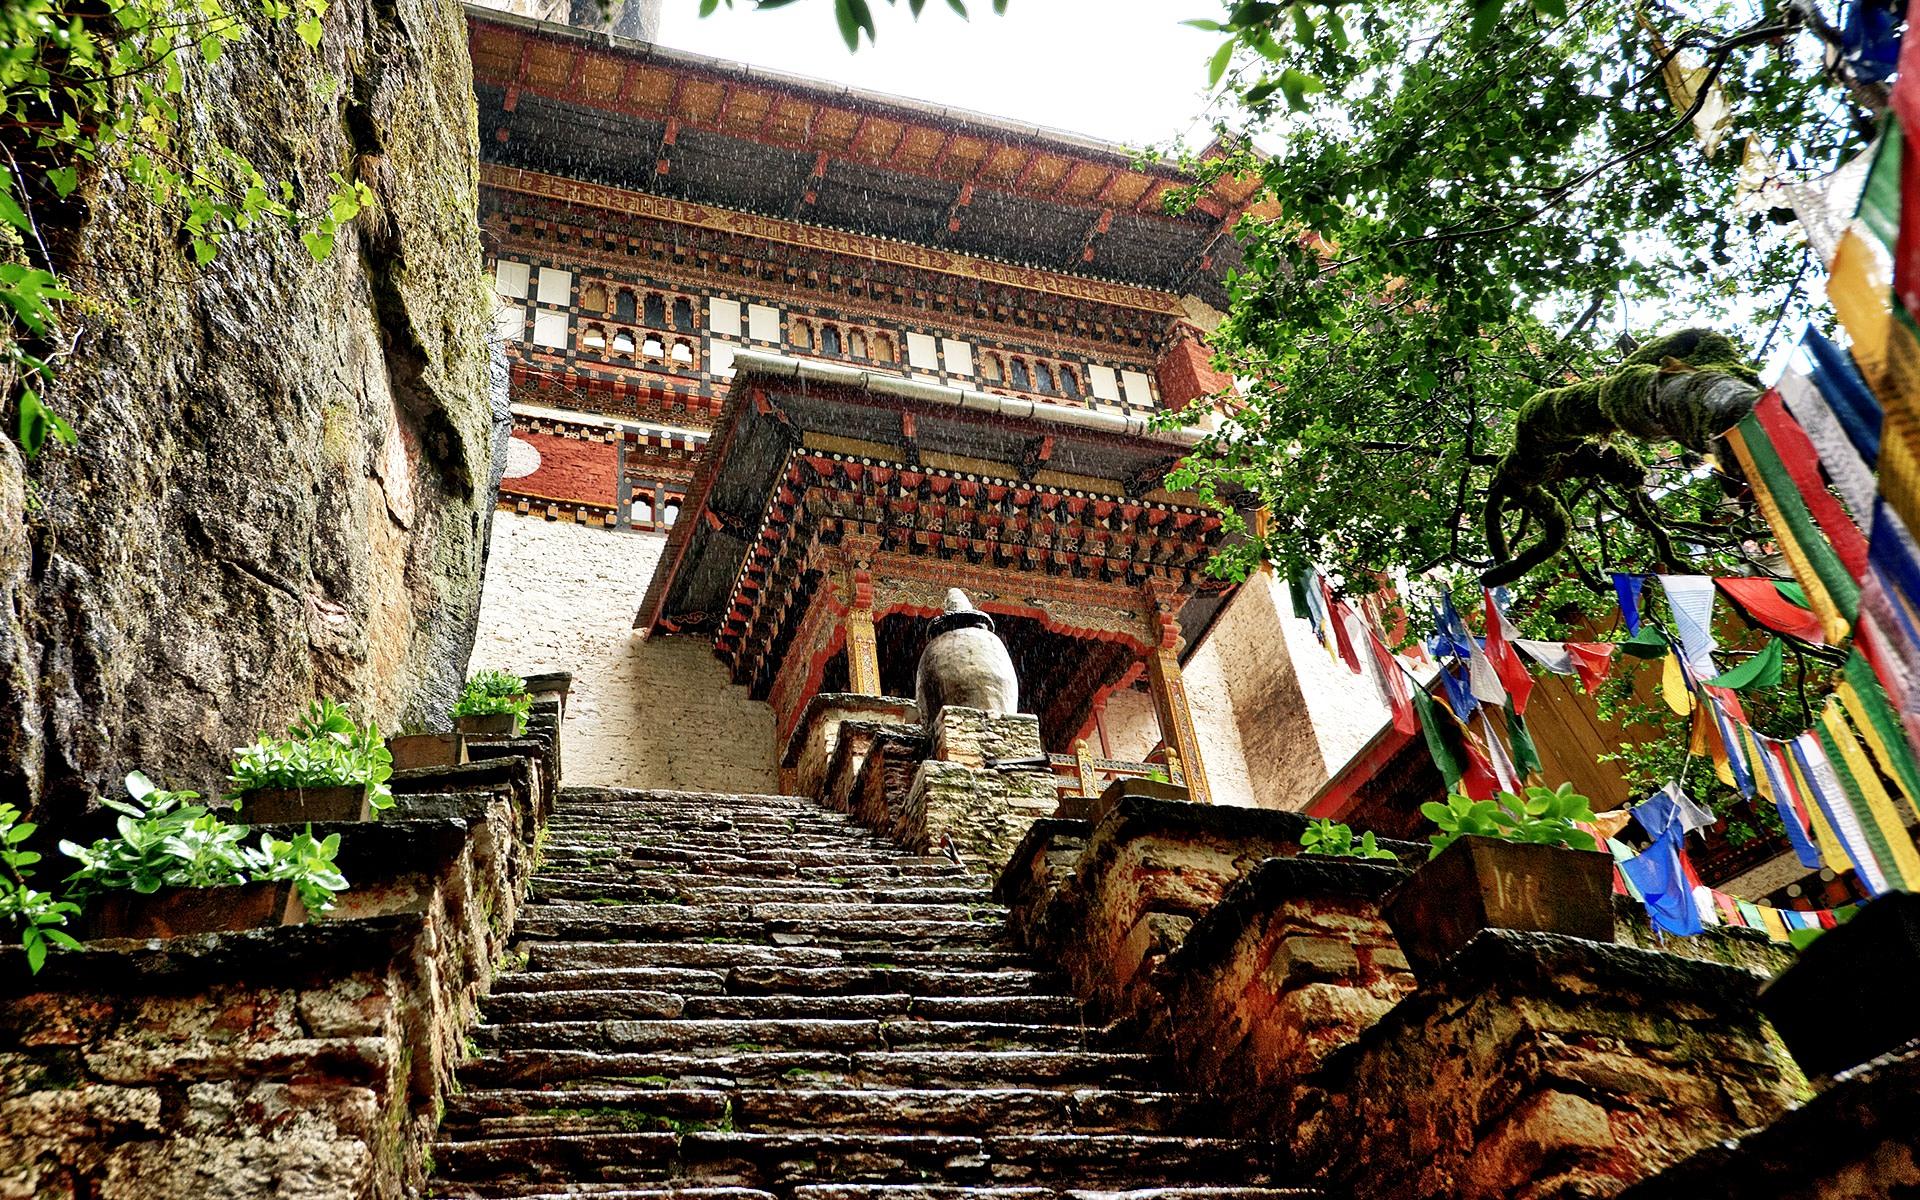 монастырская лестница